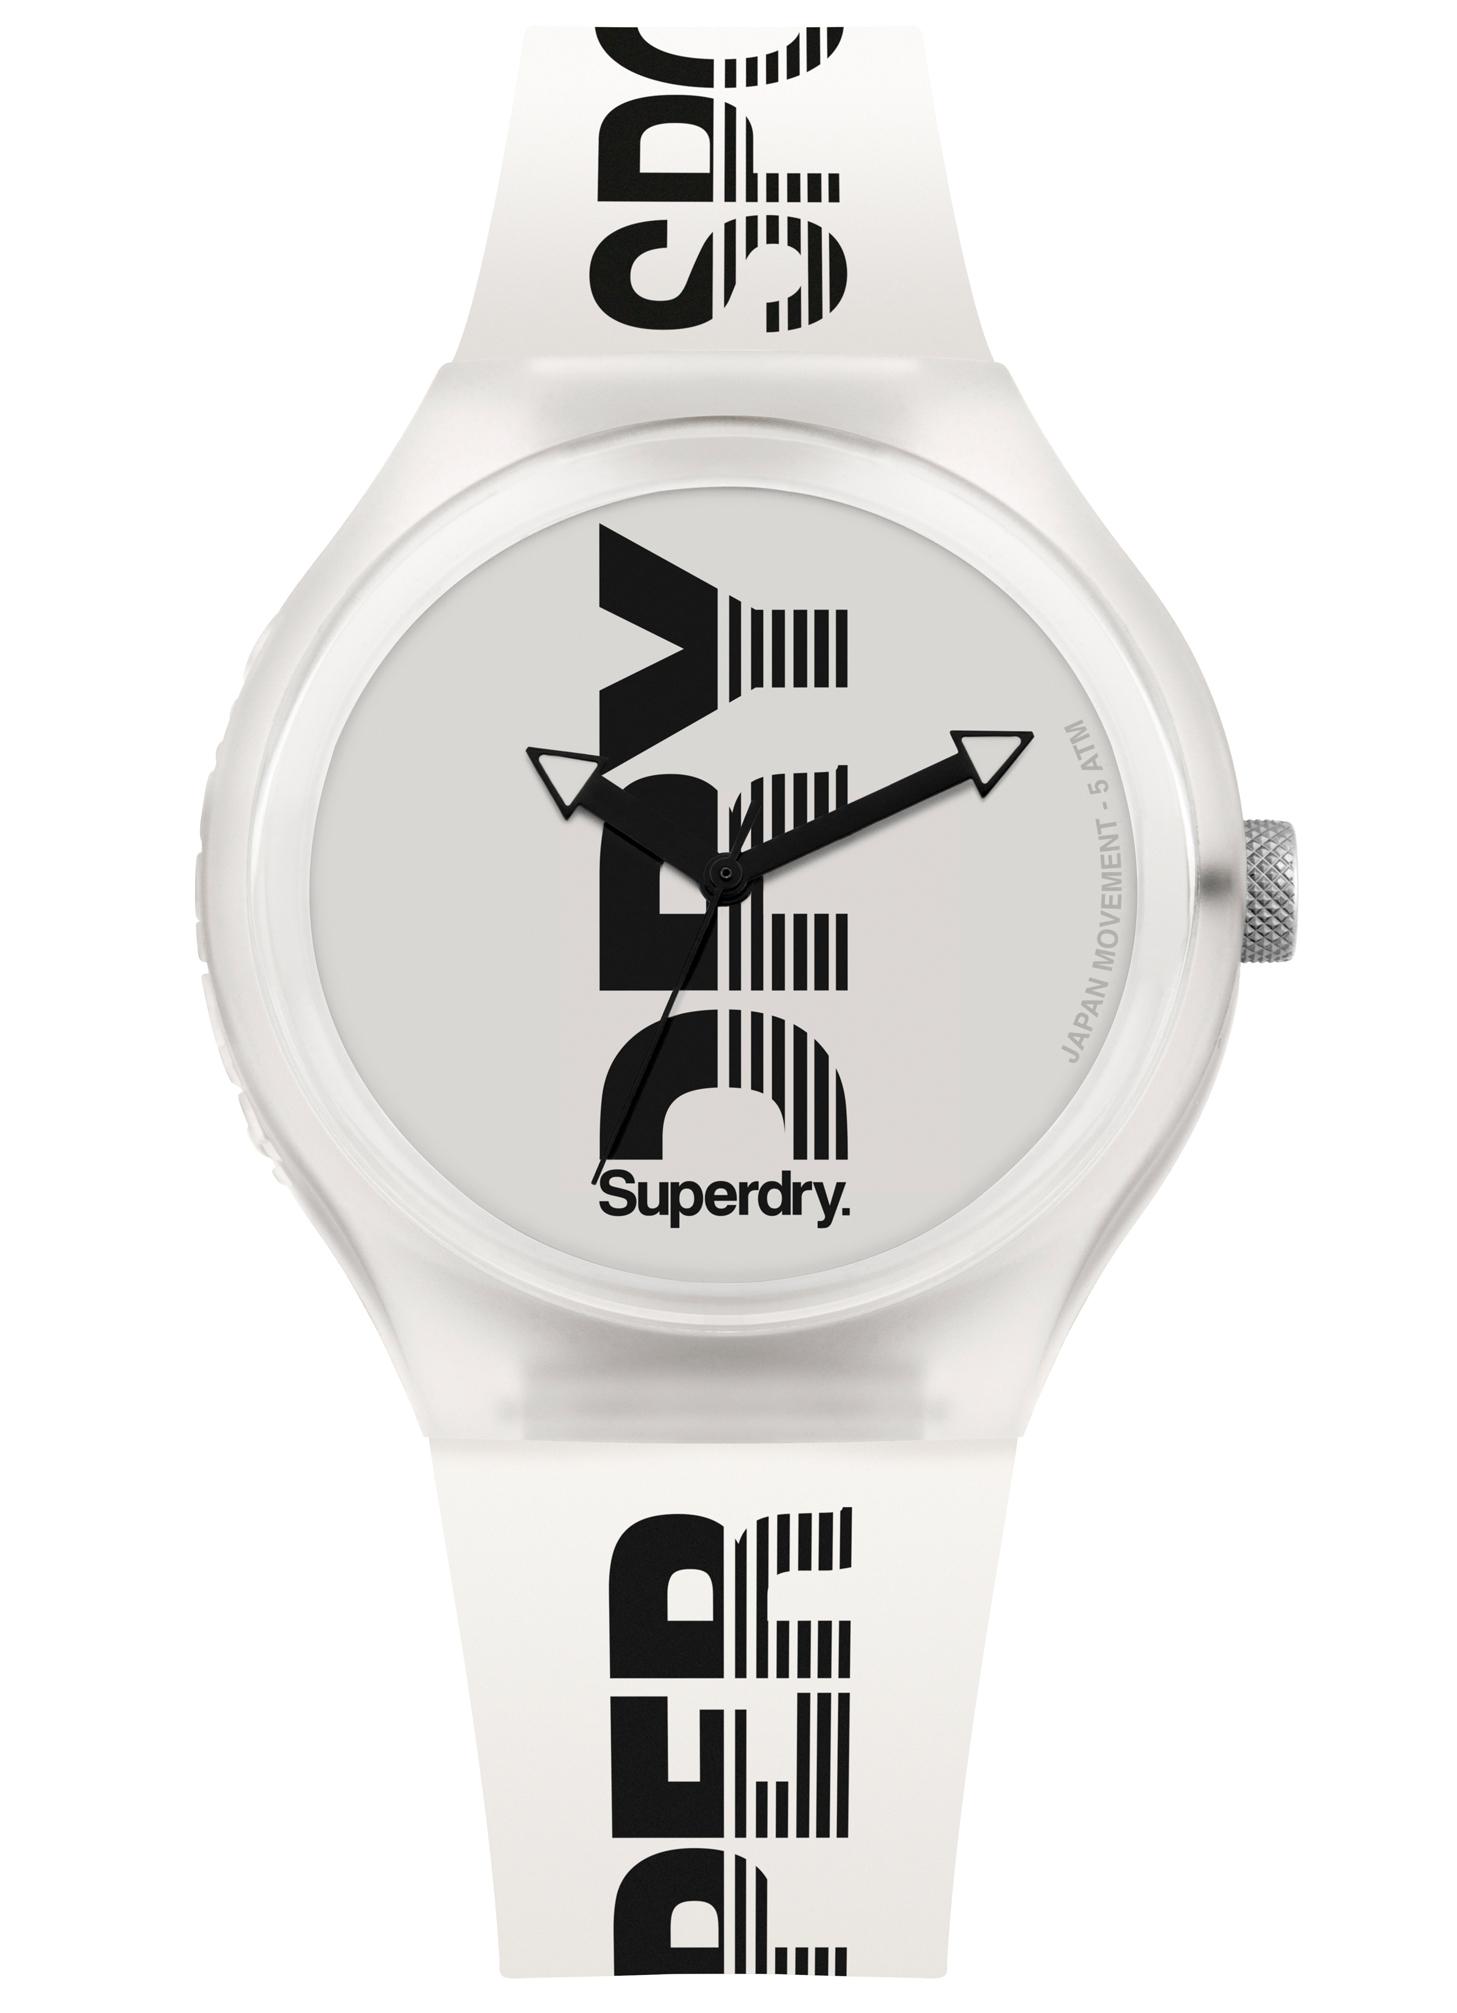 superdry_watches_SDSYG189W.jpg